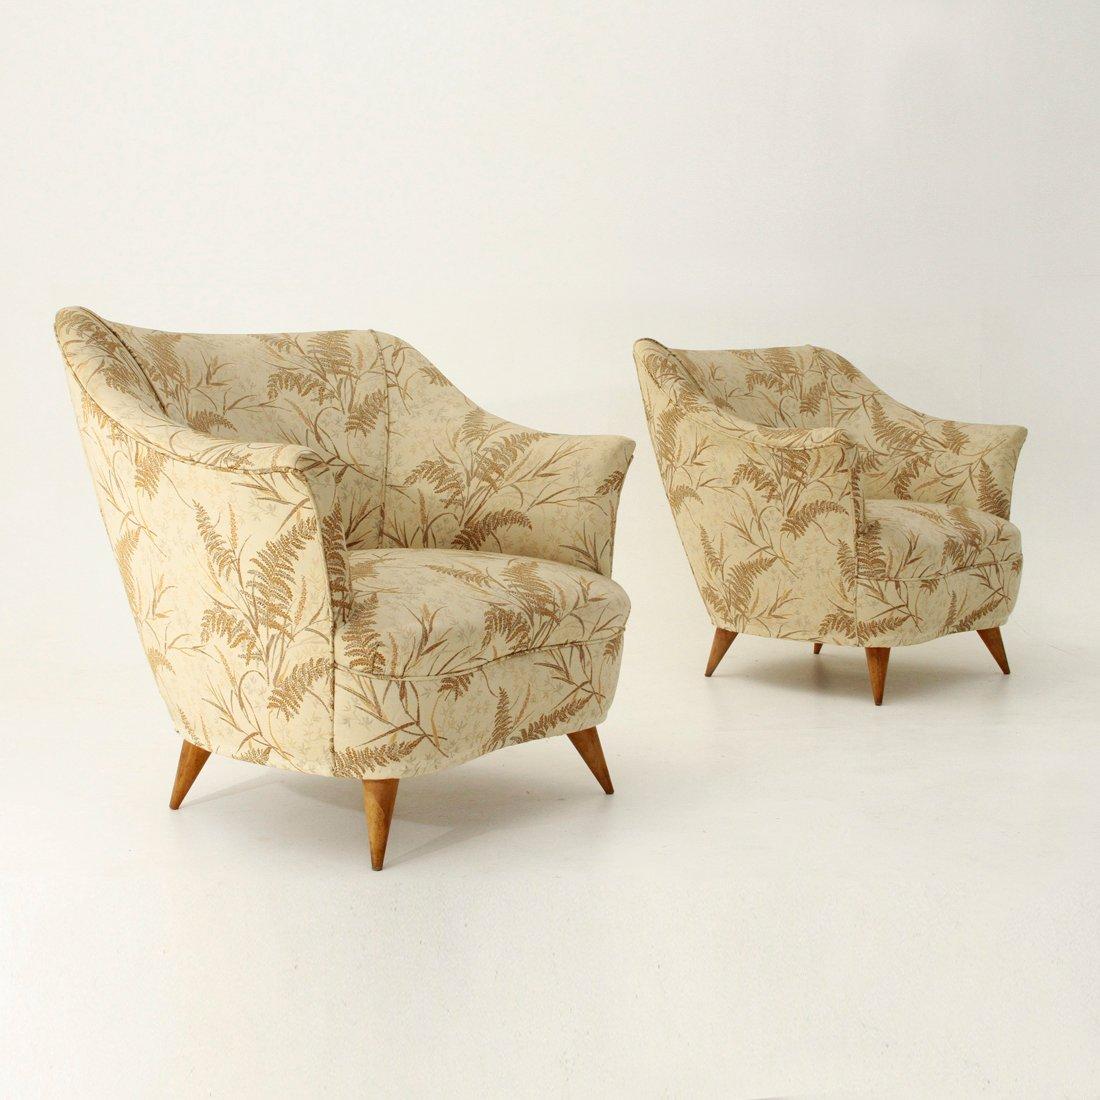 italienische mid century sessel 1950er 2er set bei pamono kaufen. Black Bedroom Furniture Sets. Home Design Ideas